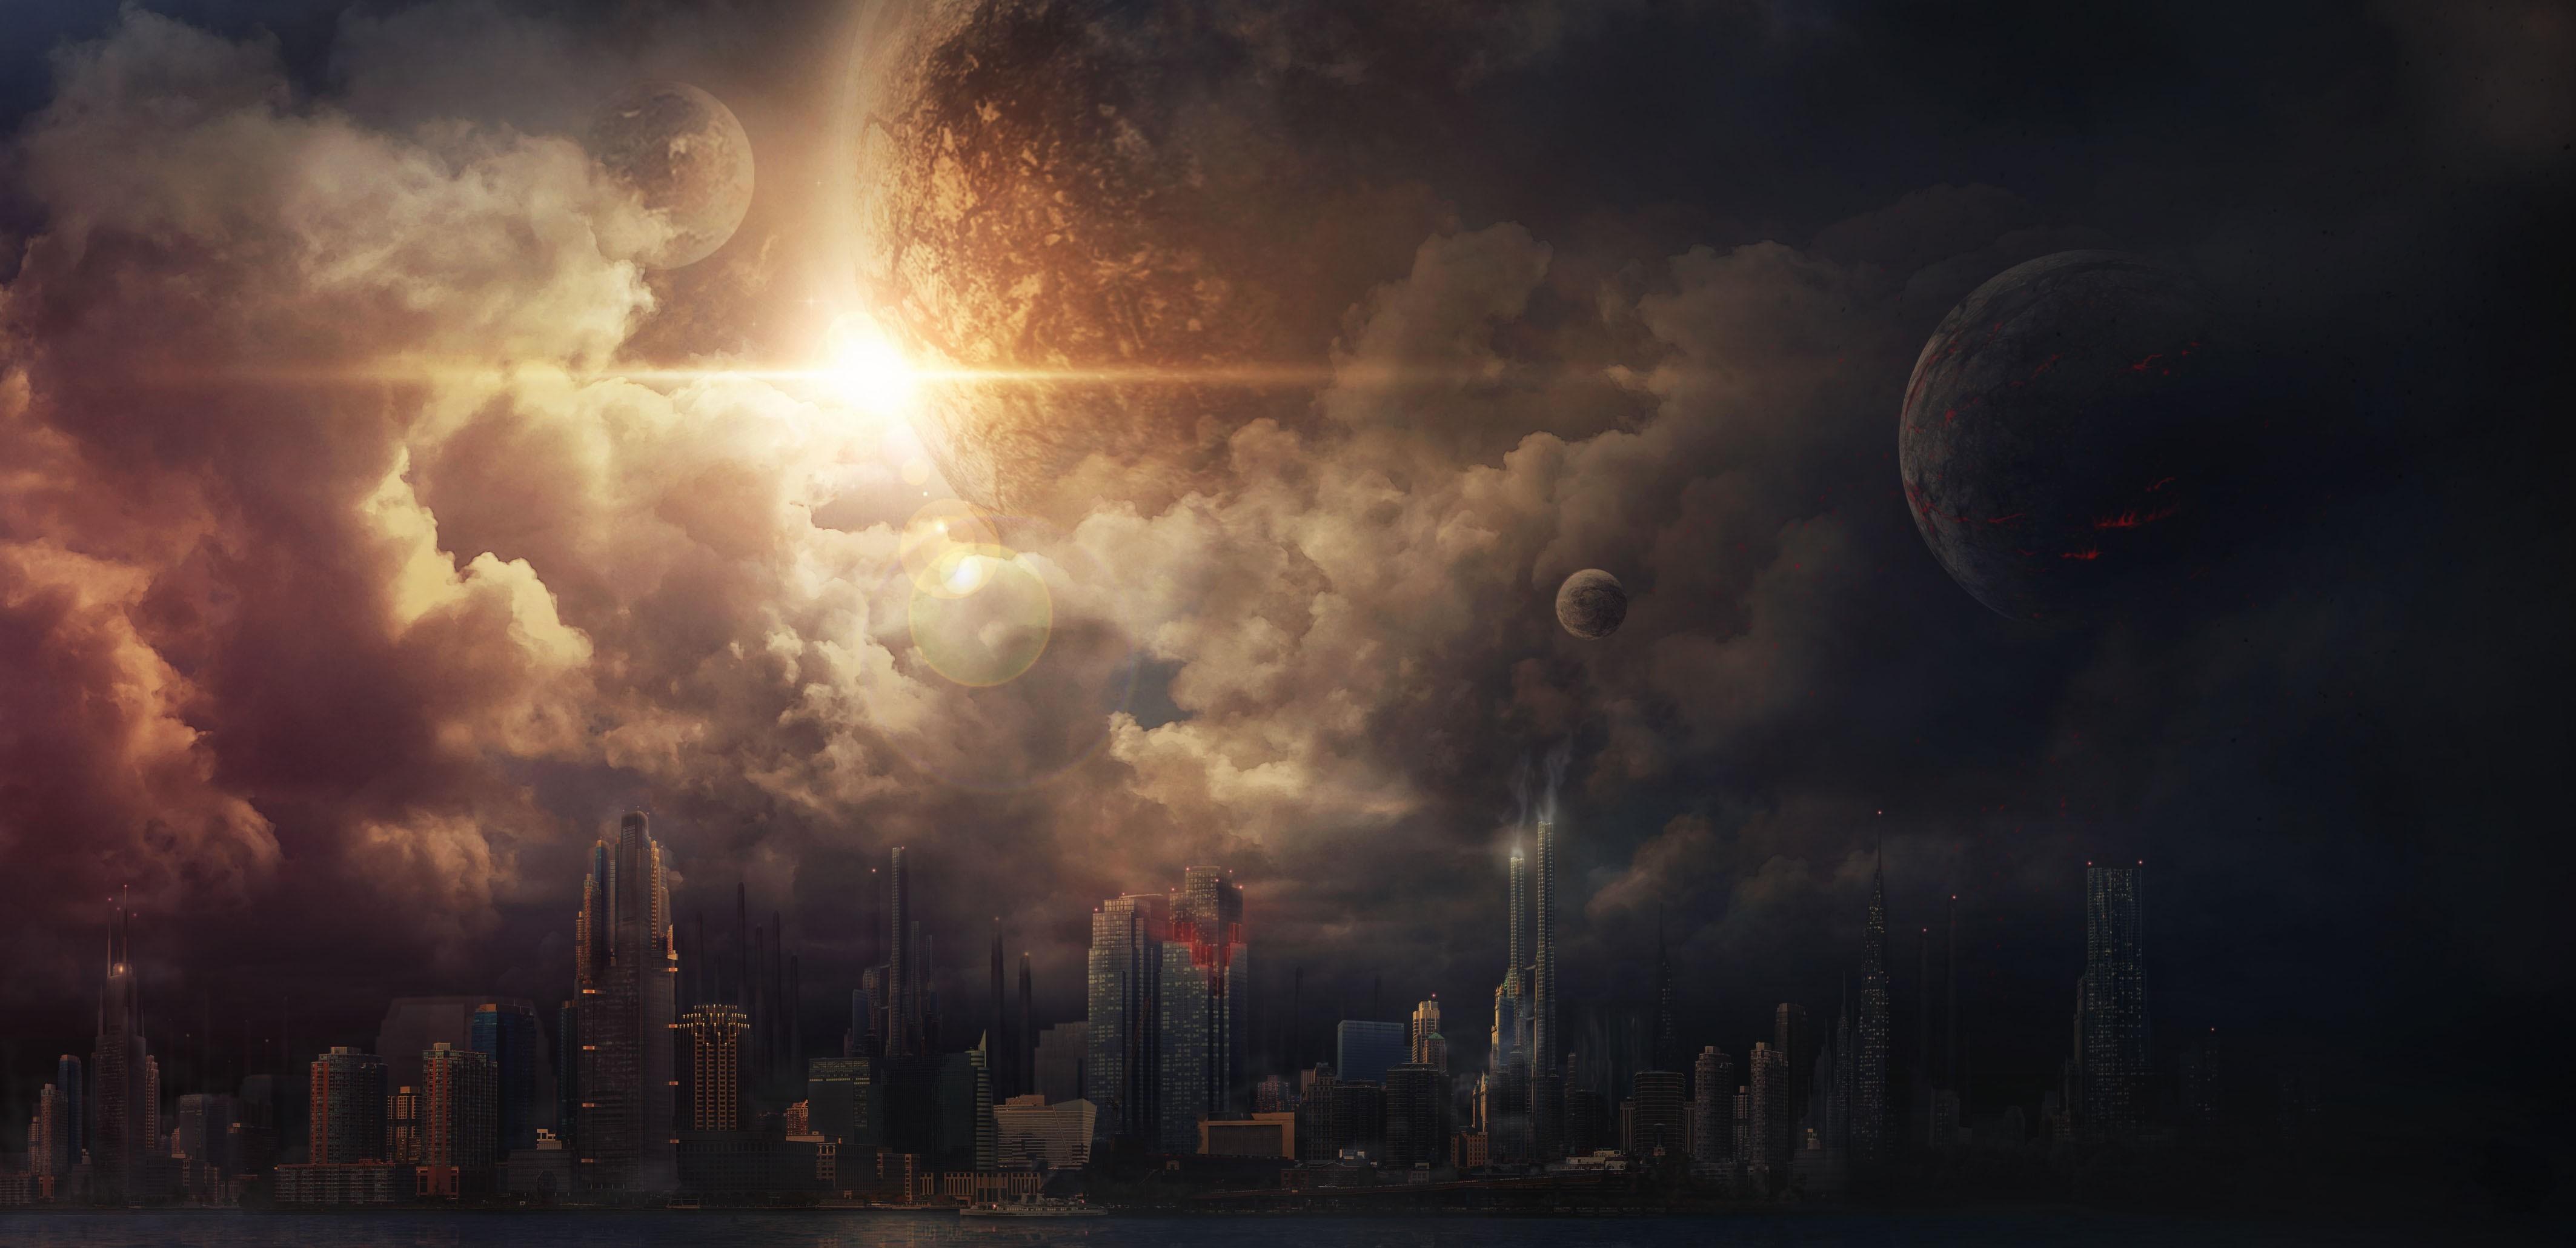 General 4252x2060 digital art eclipse  space art apocalyptic